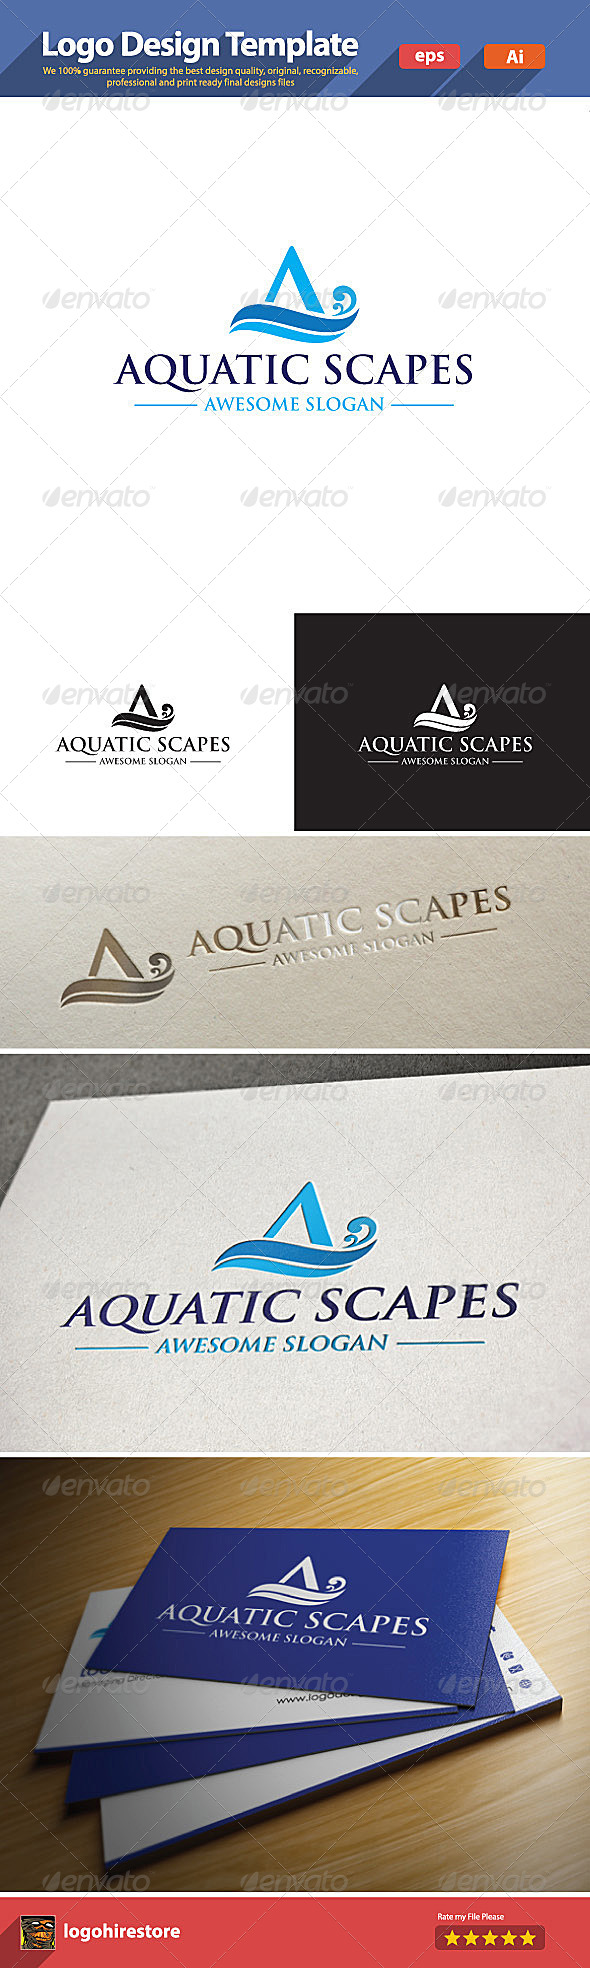 Logotipos para Spas y Centros Welness.